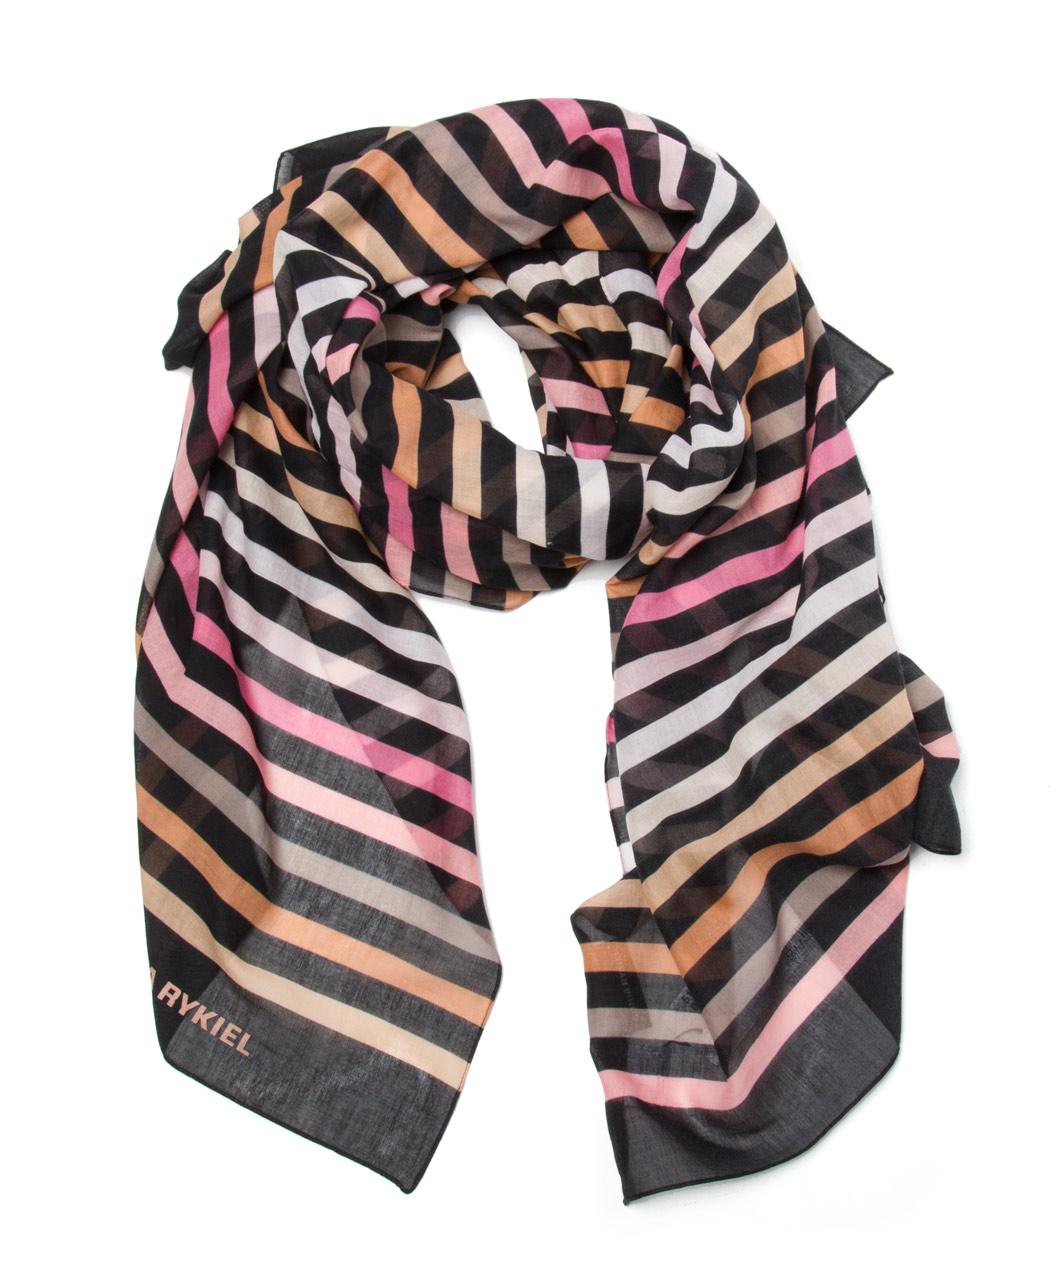 Sonia Rykiel long striped scarf Cheap Websites MneoHYF